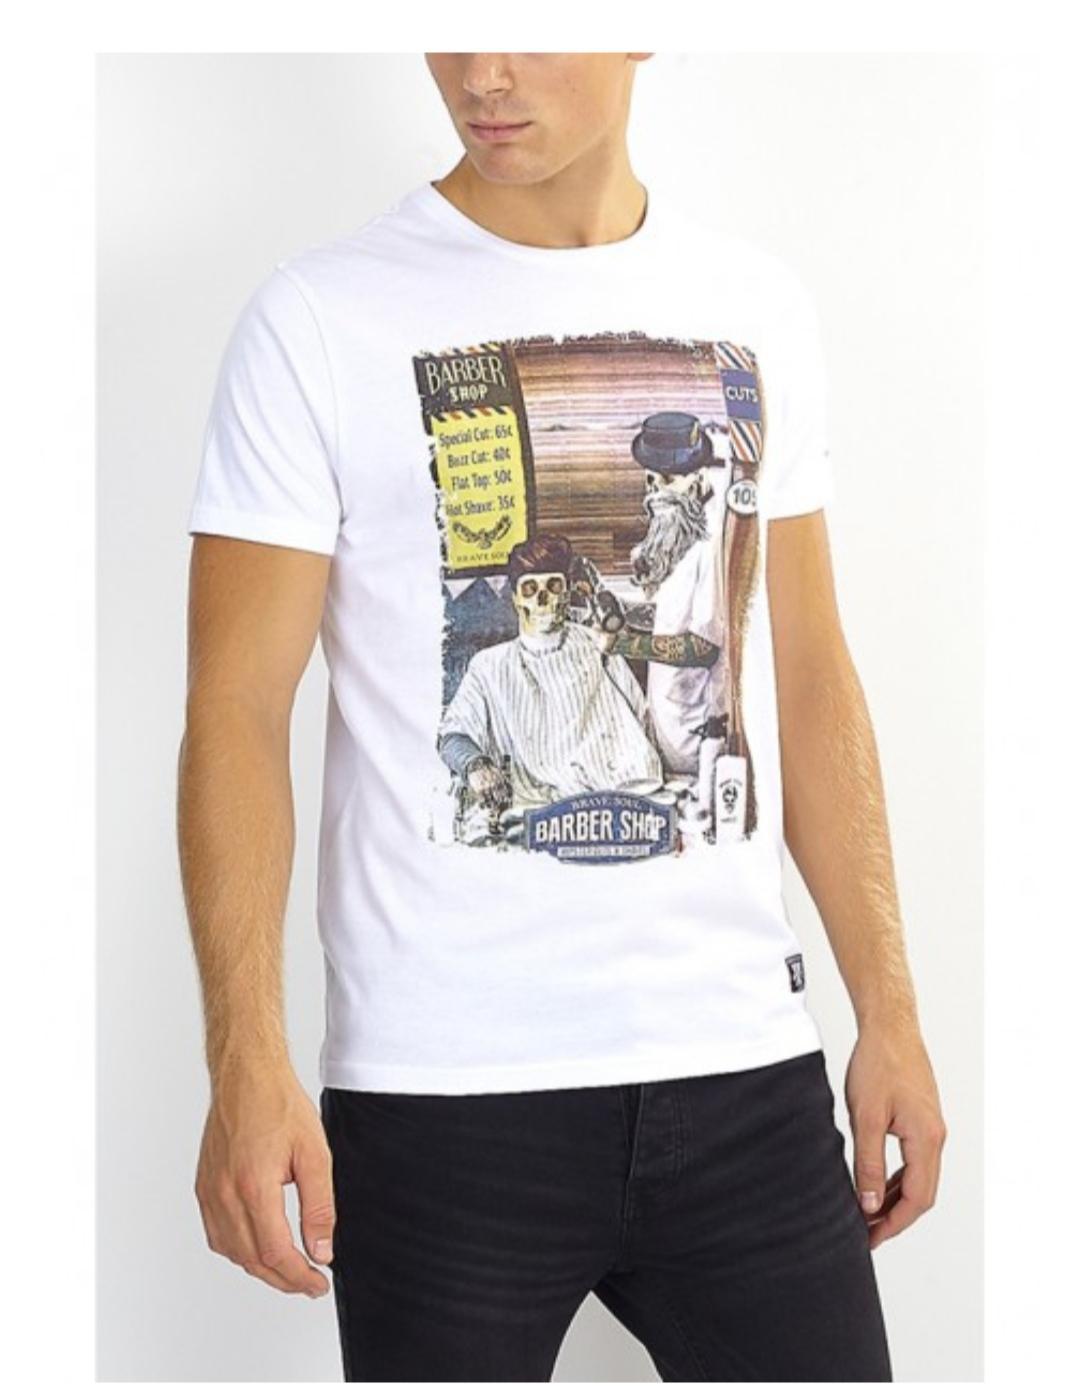 Camiseta barbershop2